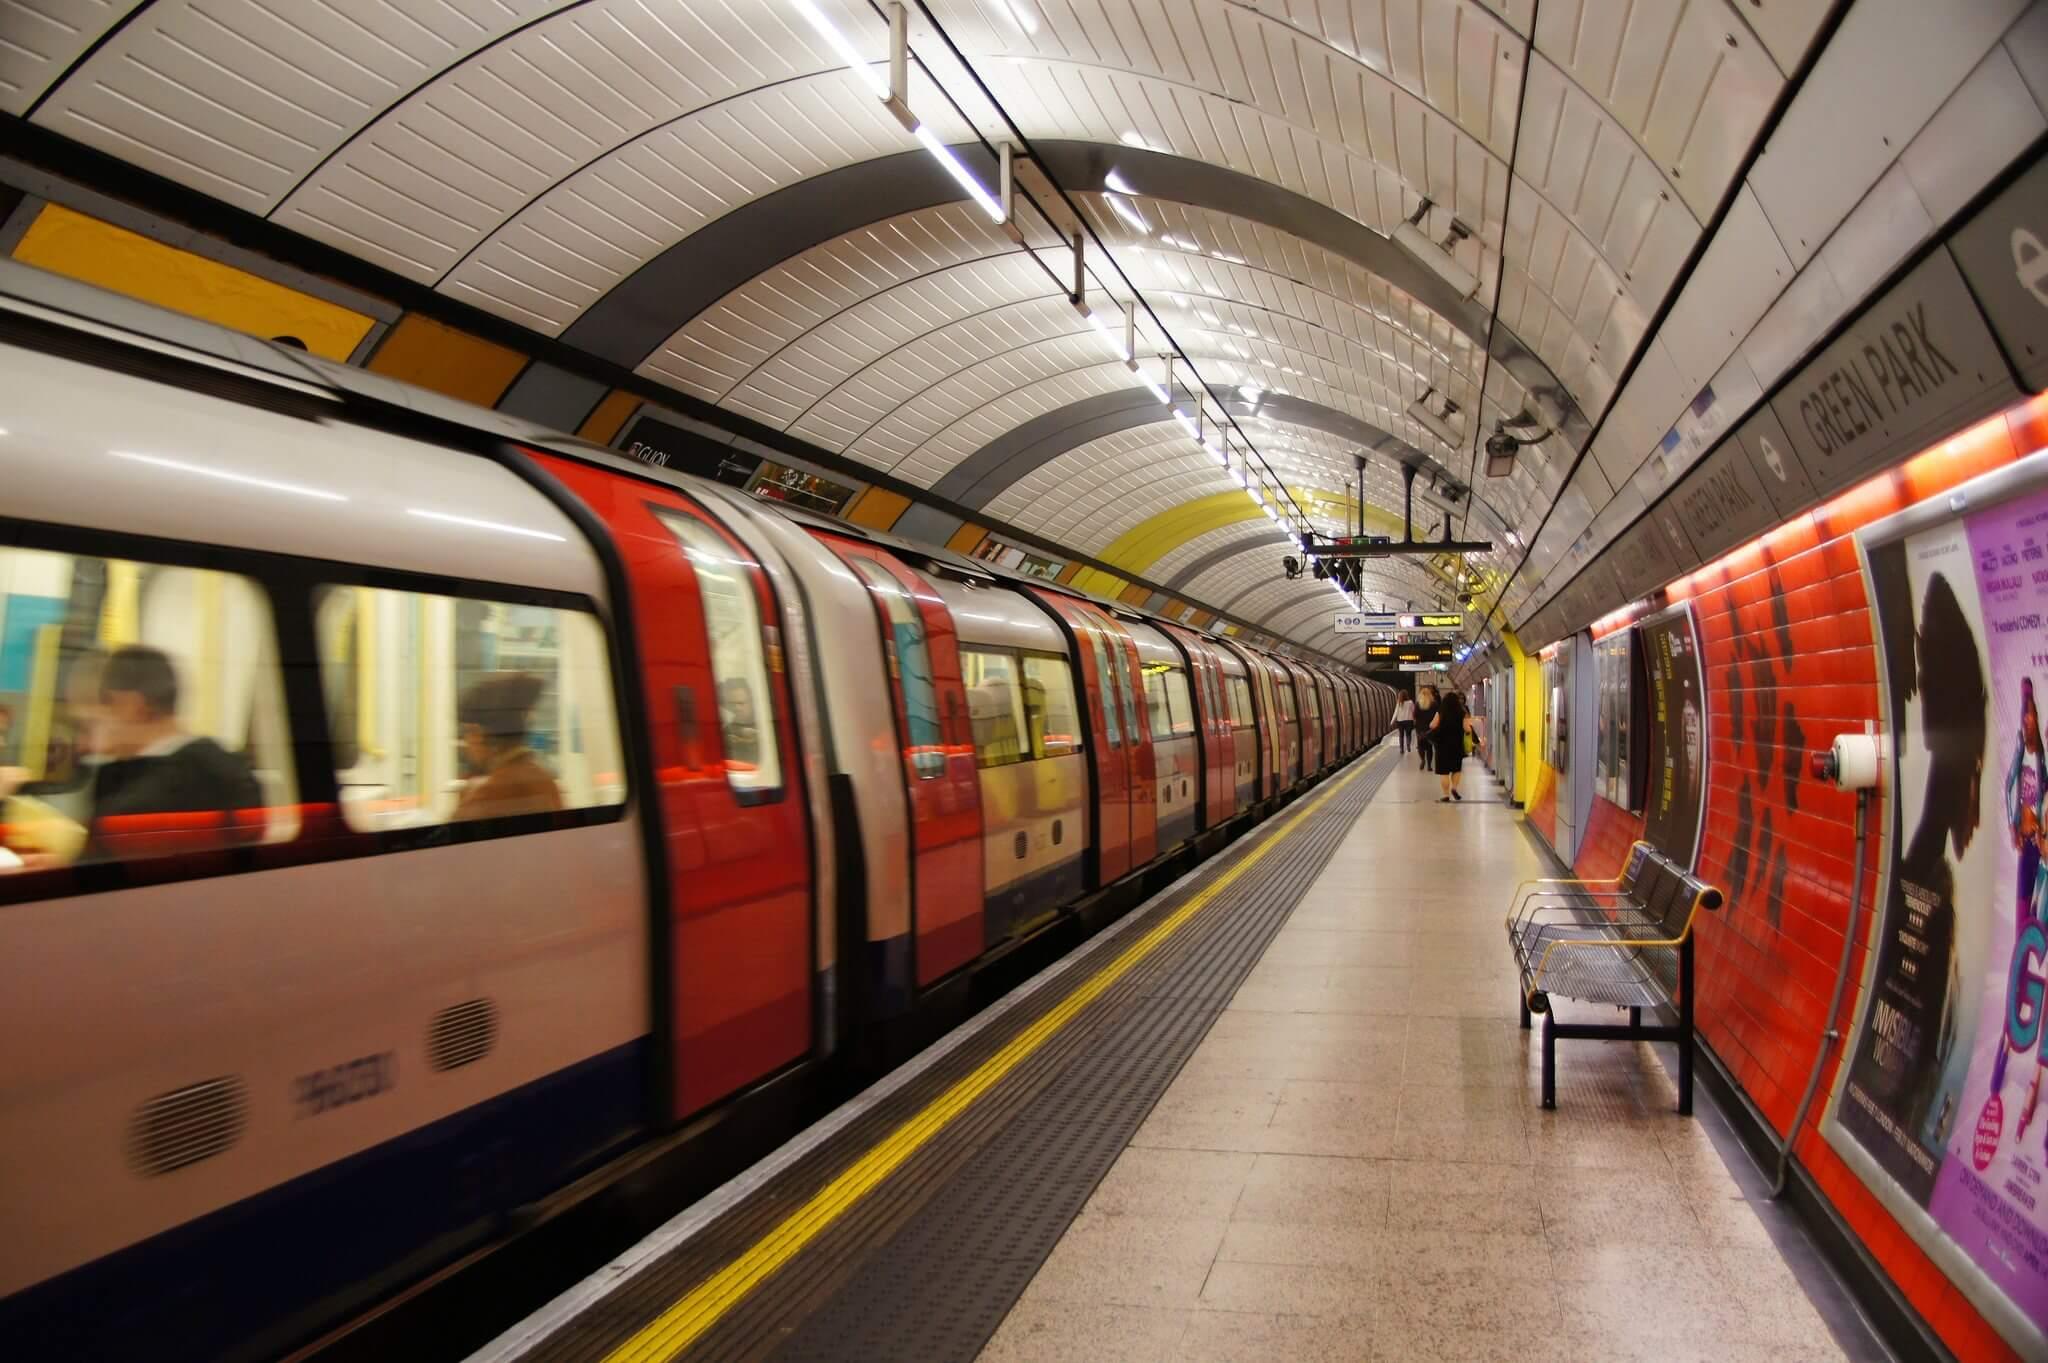 Exploring the London Underground